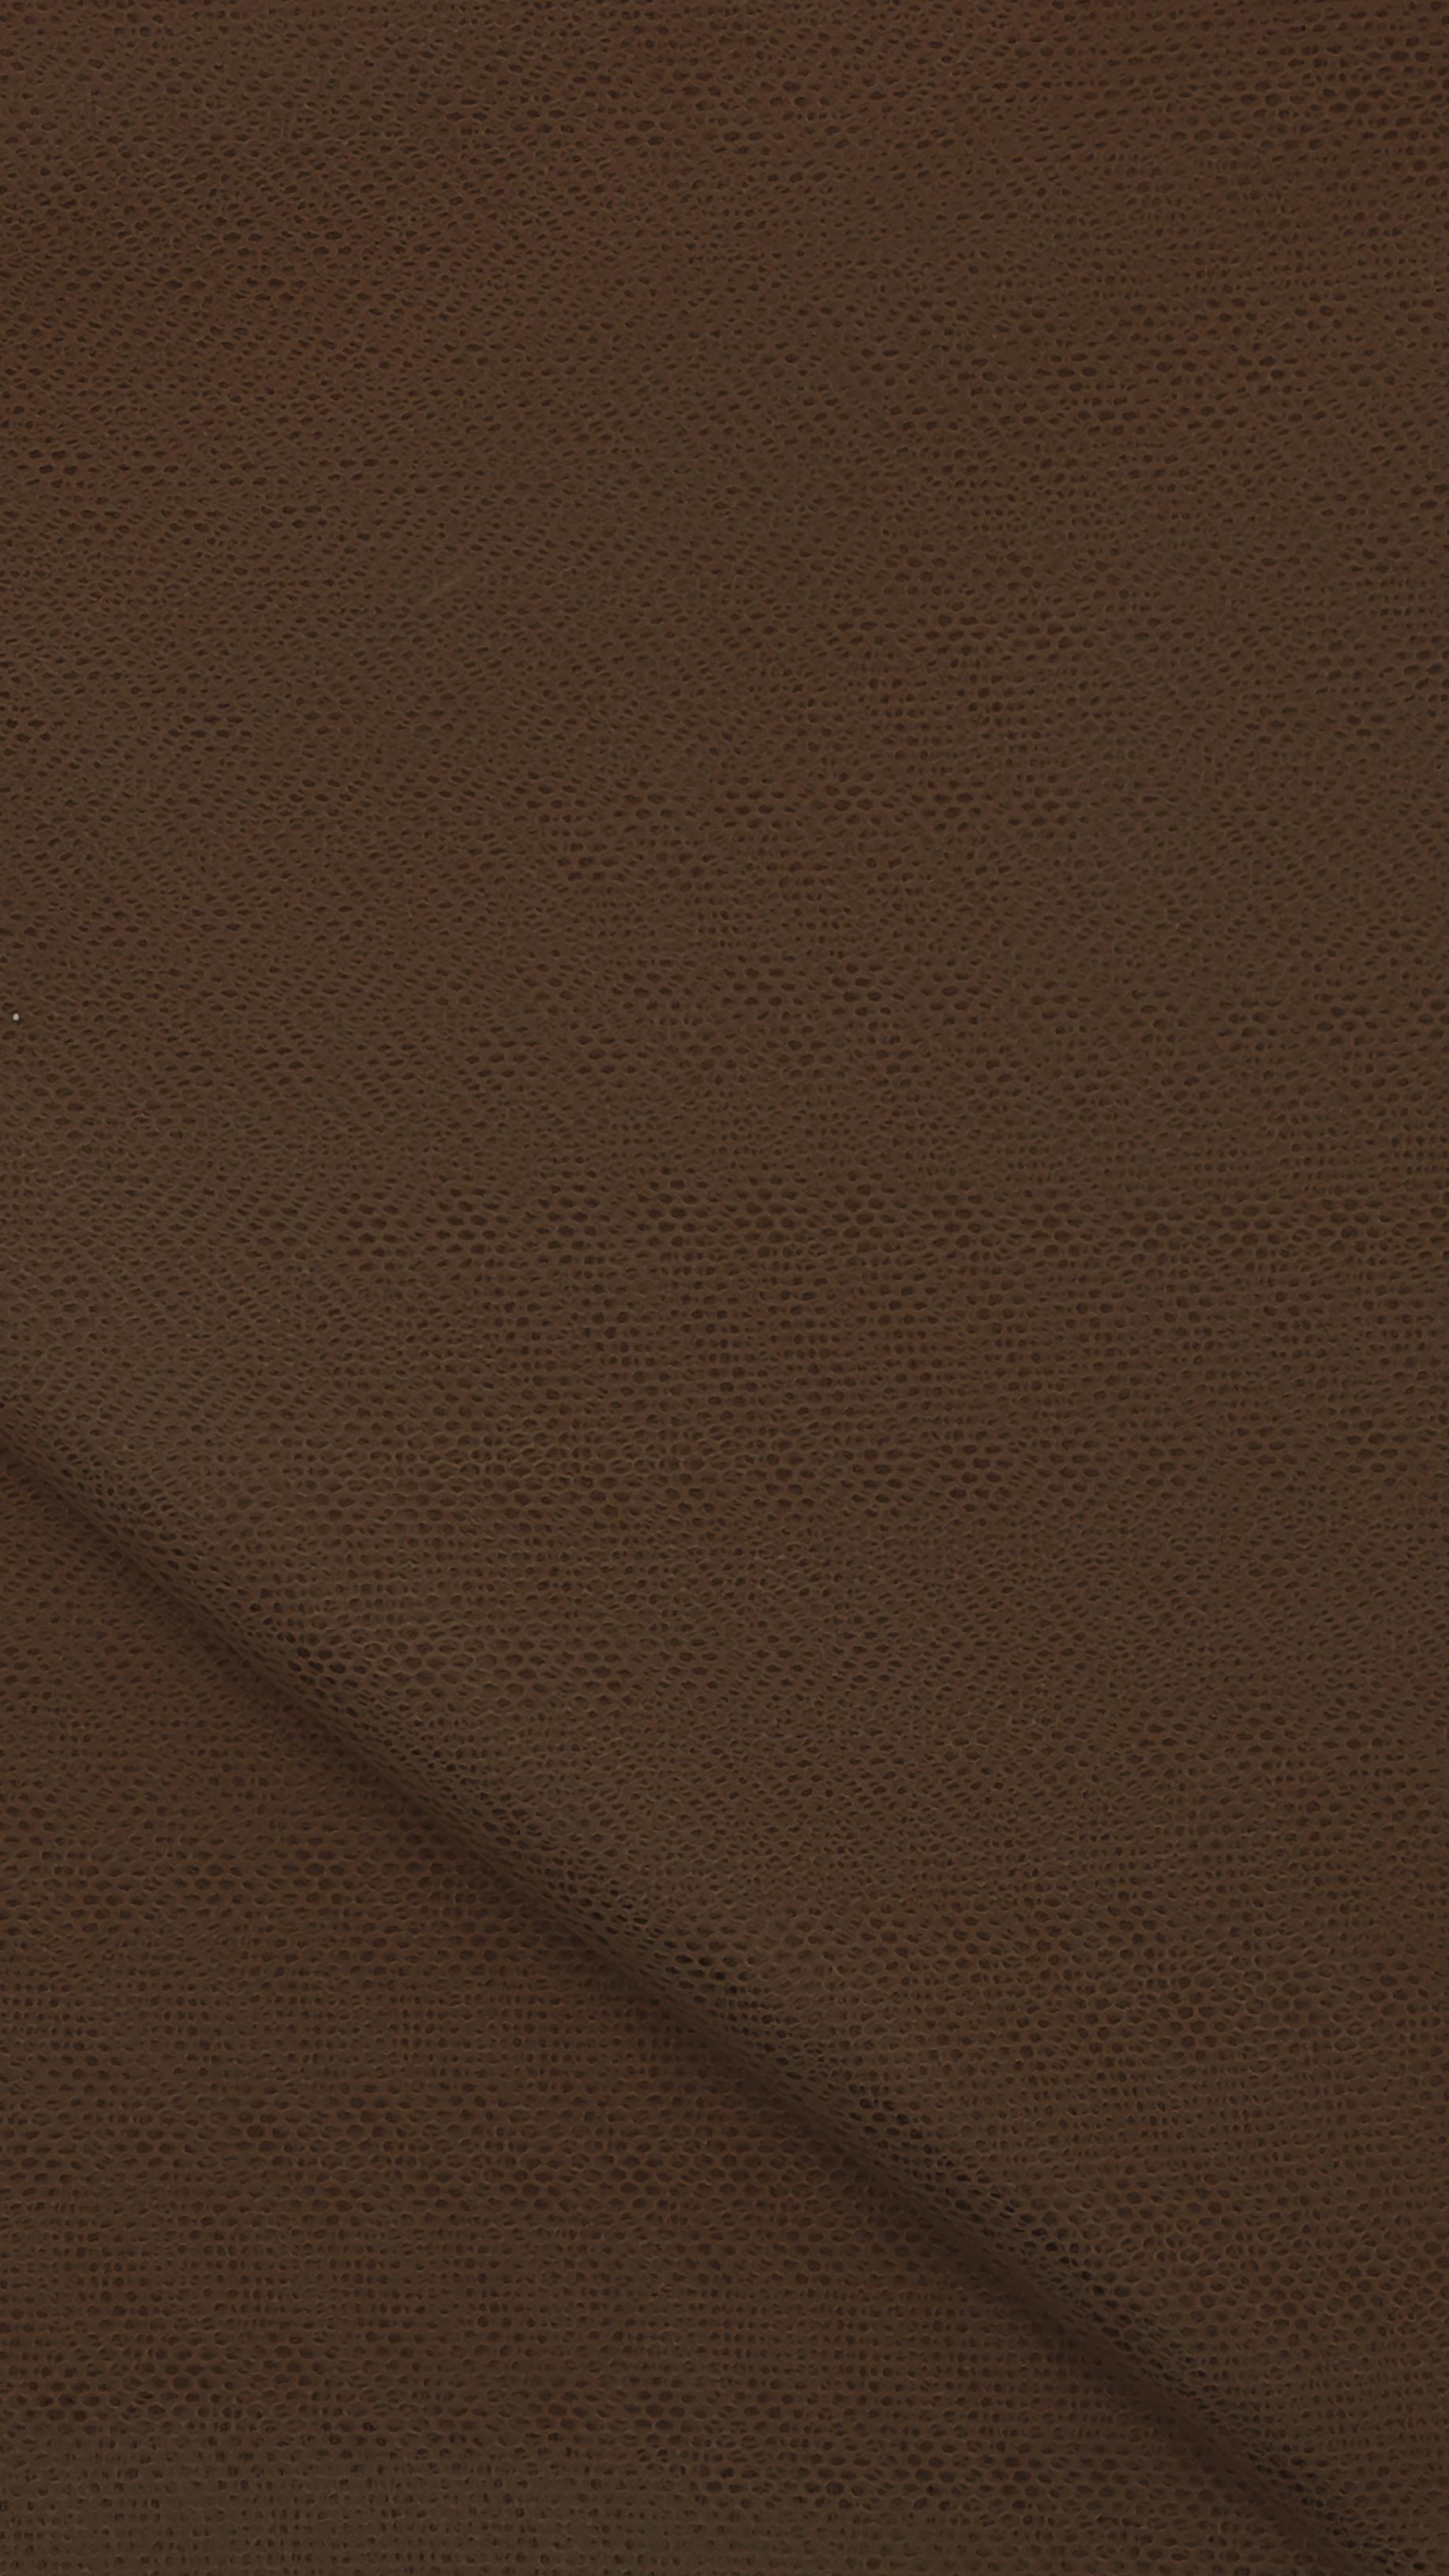 Chocolate Cake | DressAnomalie